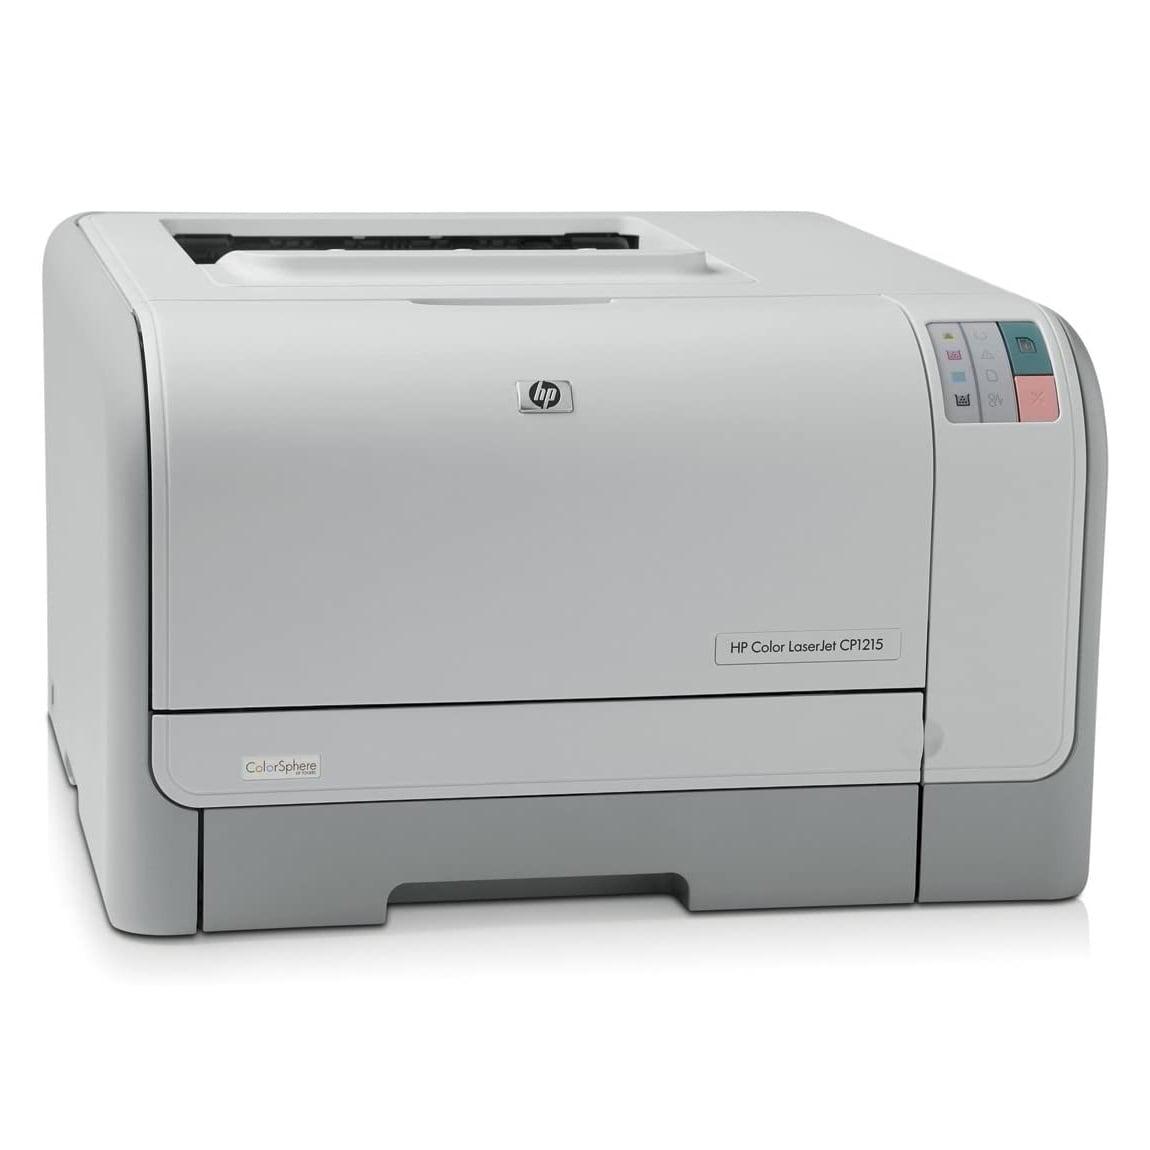 پرینتر لیزری رنگی HP LaserJet CP1215 عکس 3